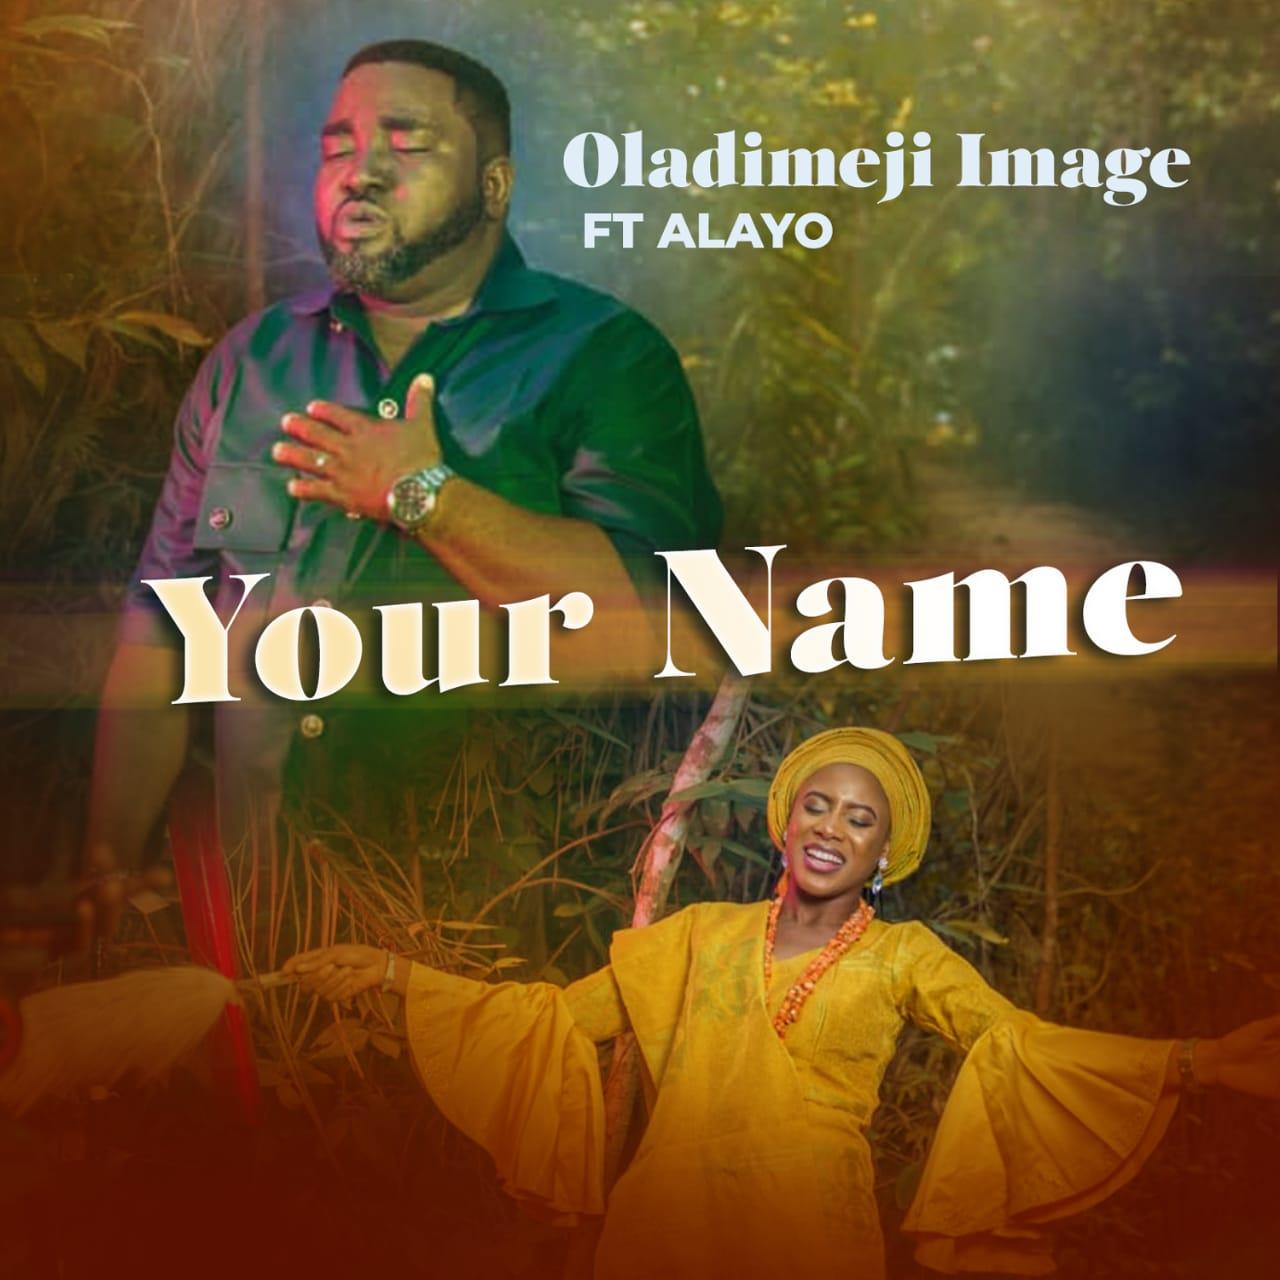 Oladimeji Image - Your Name Ft. Alayo